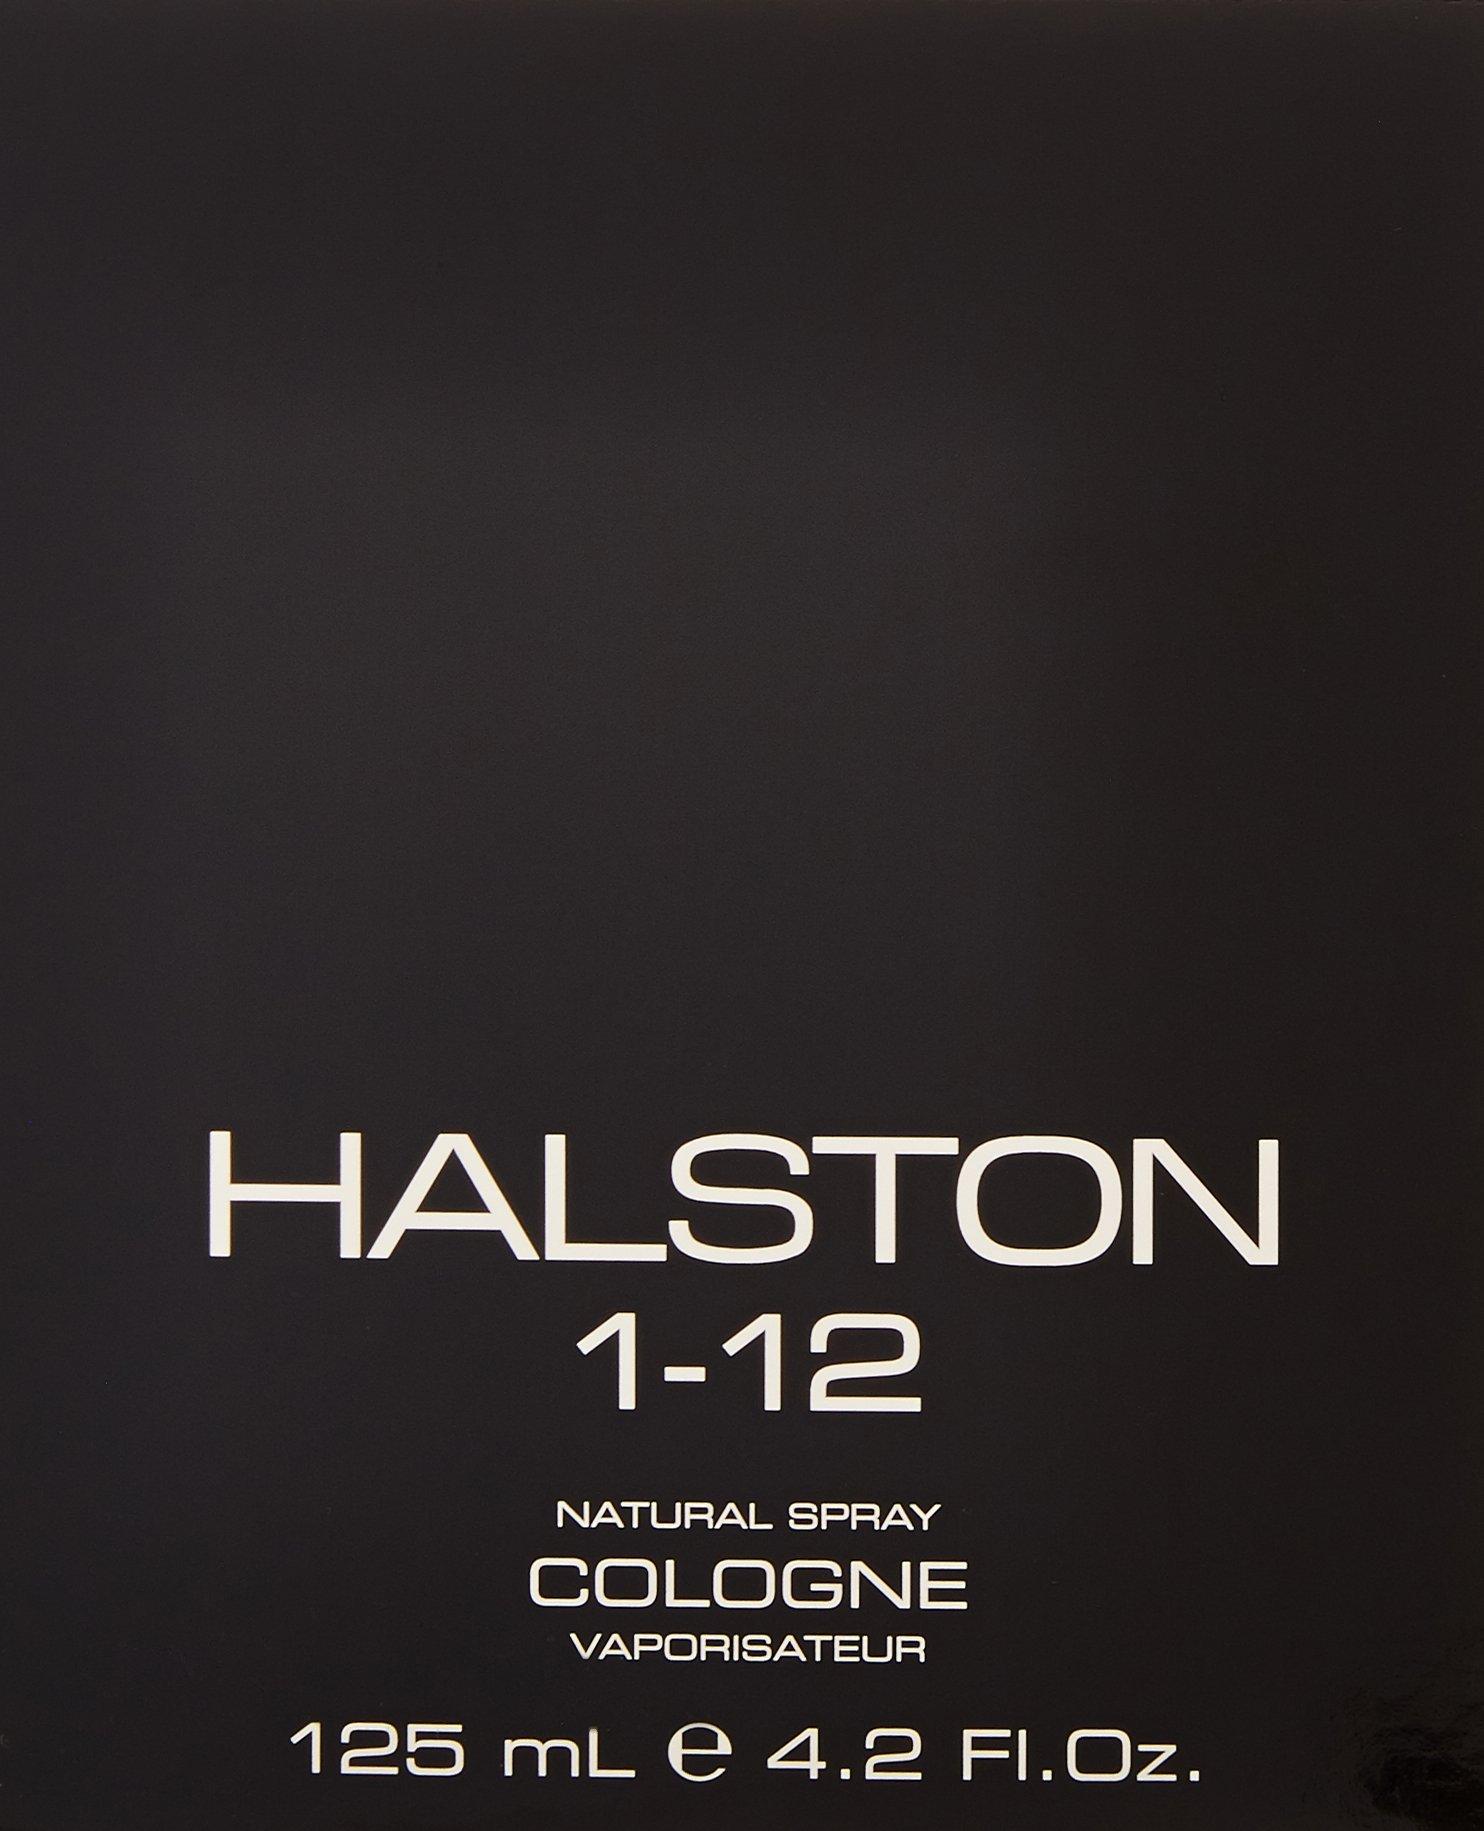 Halston 1-12 by Halston for Men 4.2 oz Cologne Spray by Halston (Image #3)